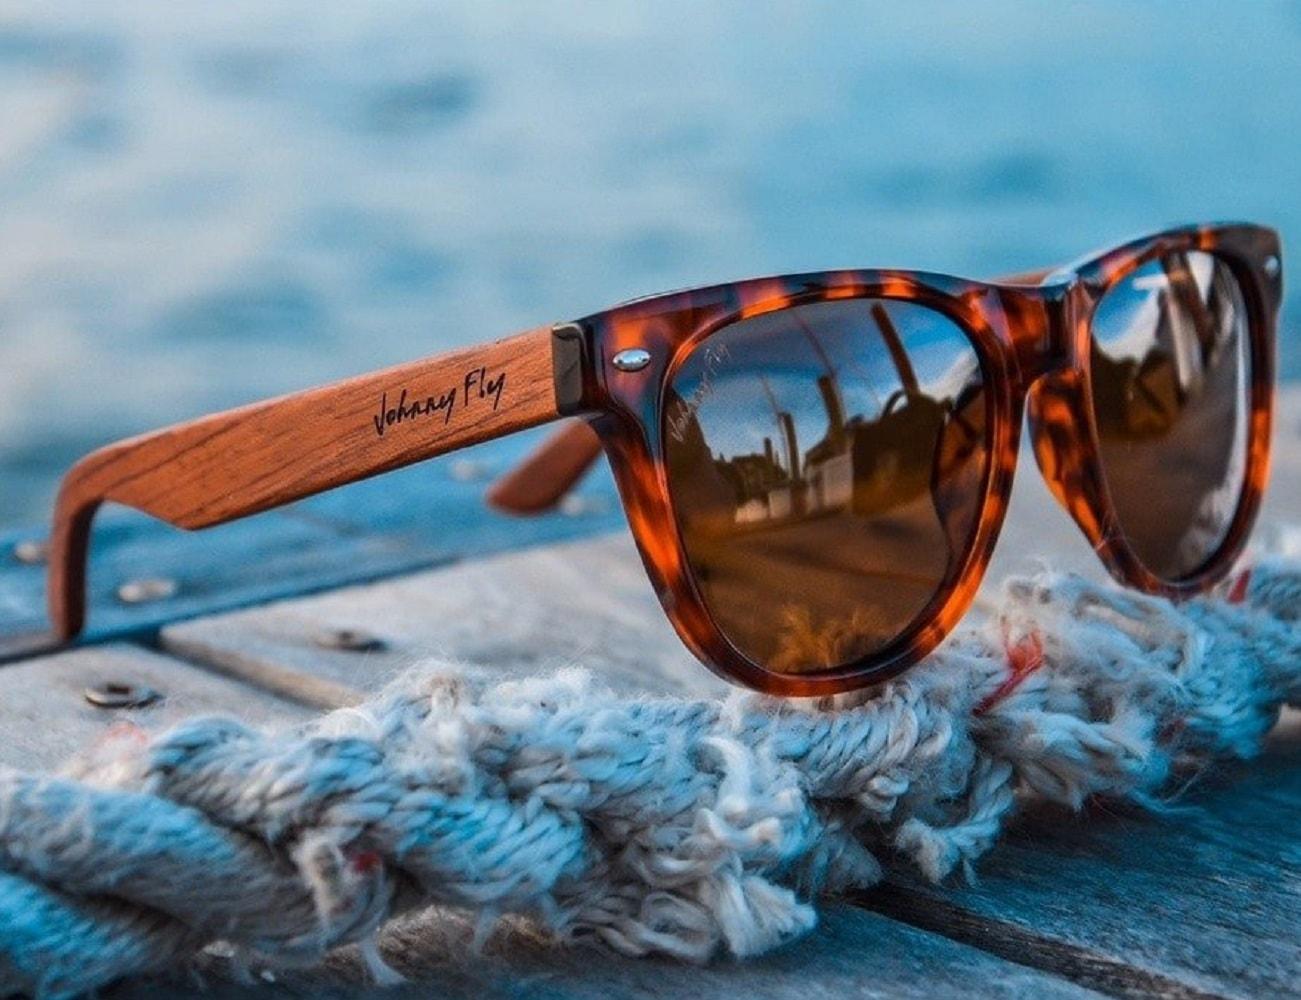 WayFLYer Redwood Violet Polarized Sunglasses